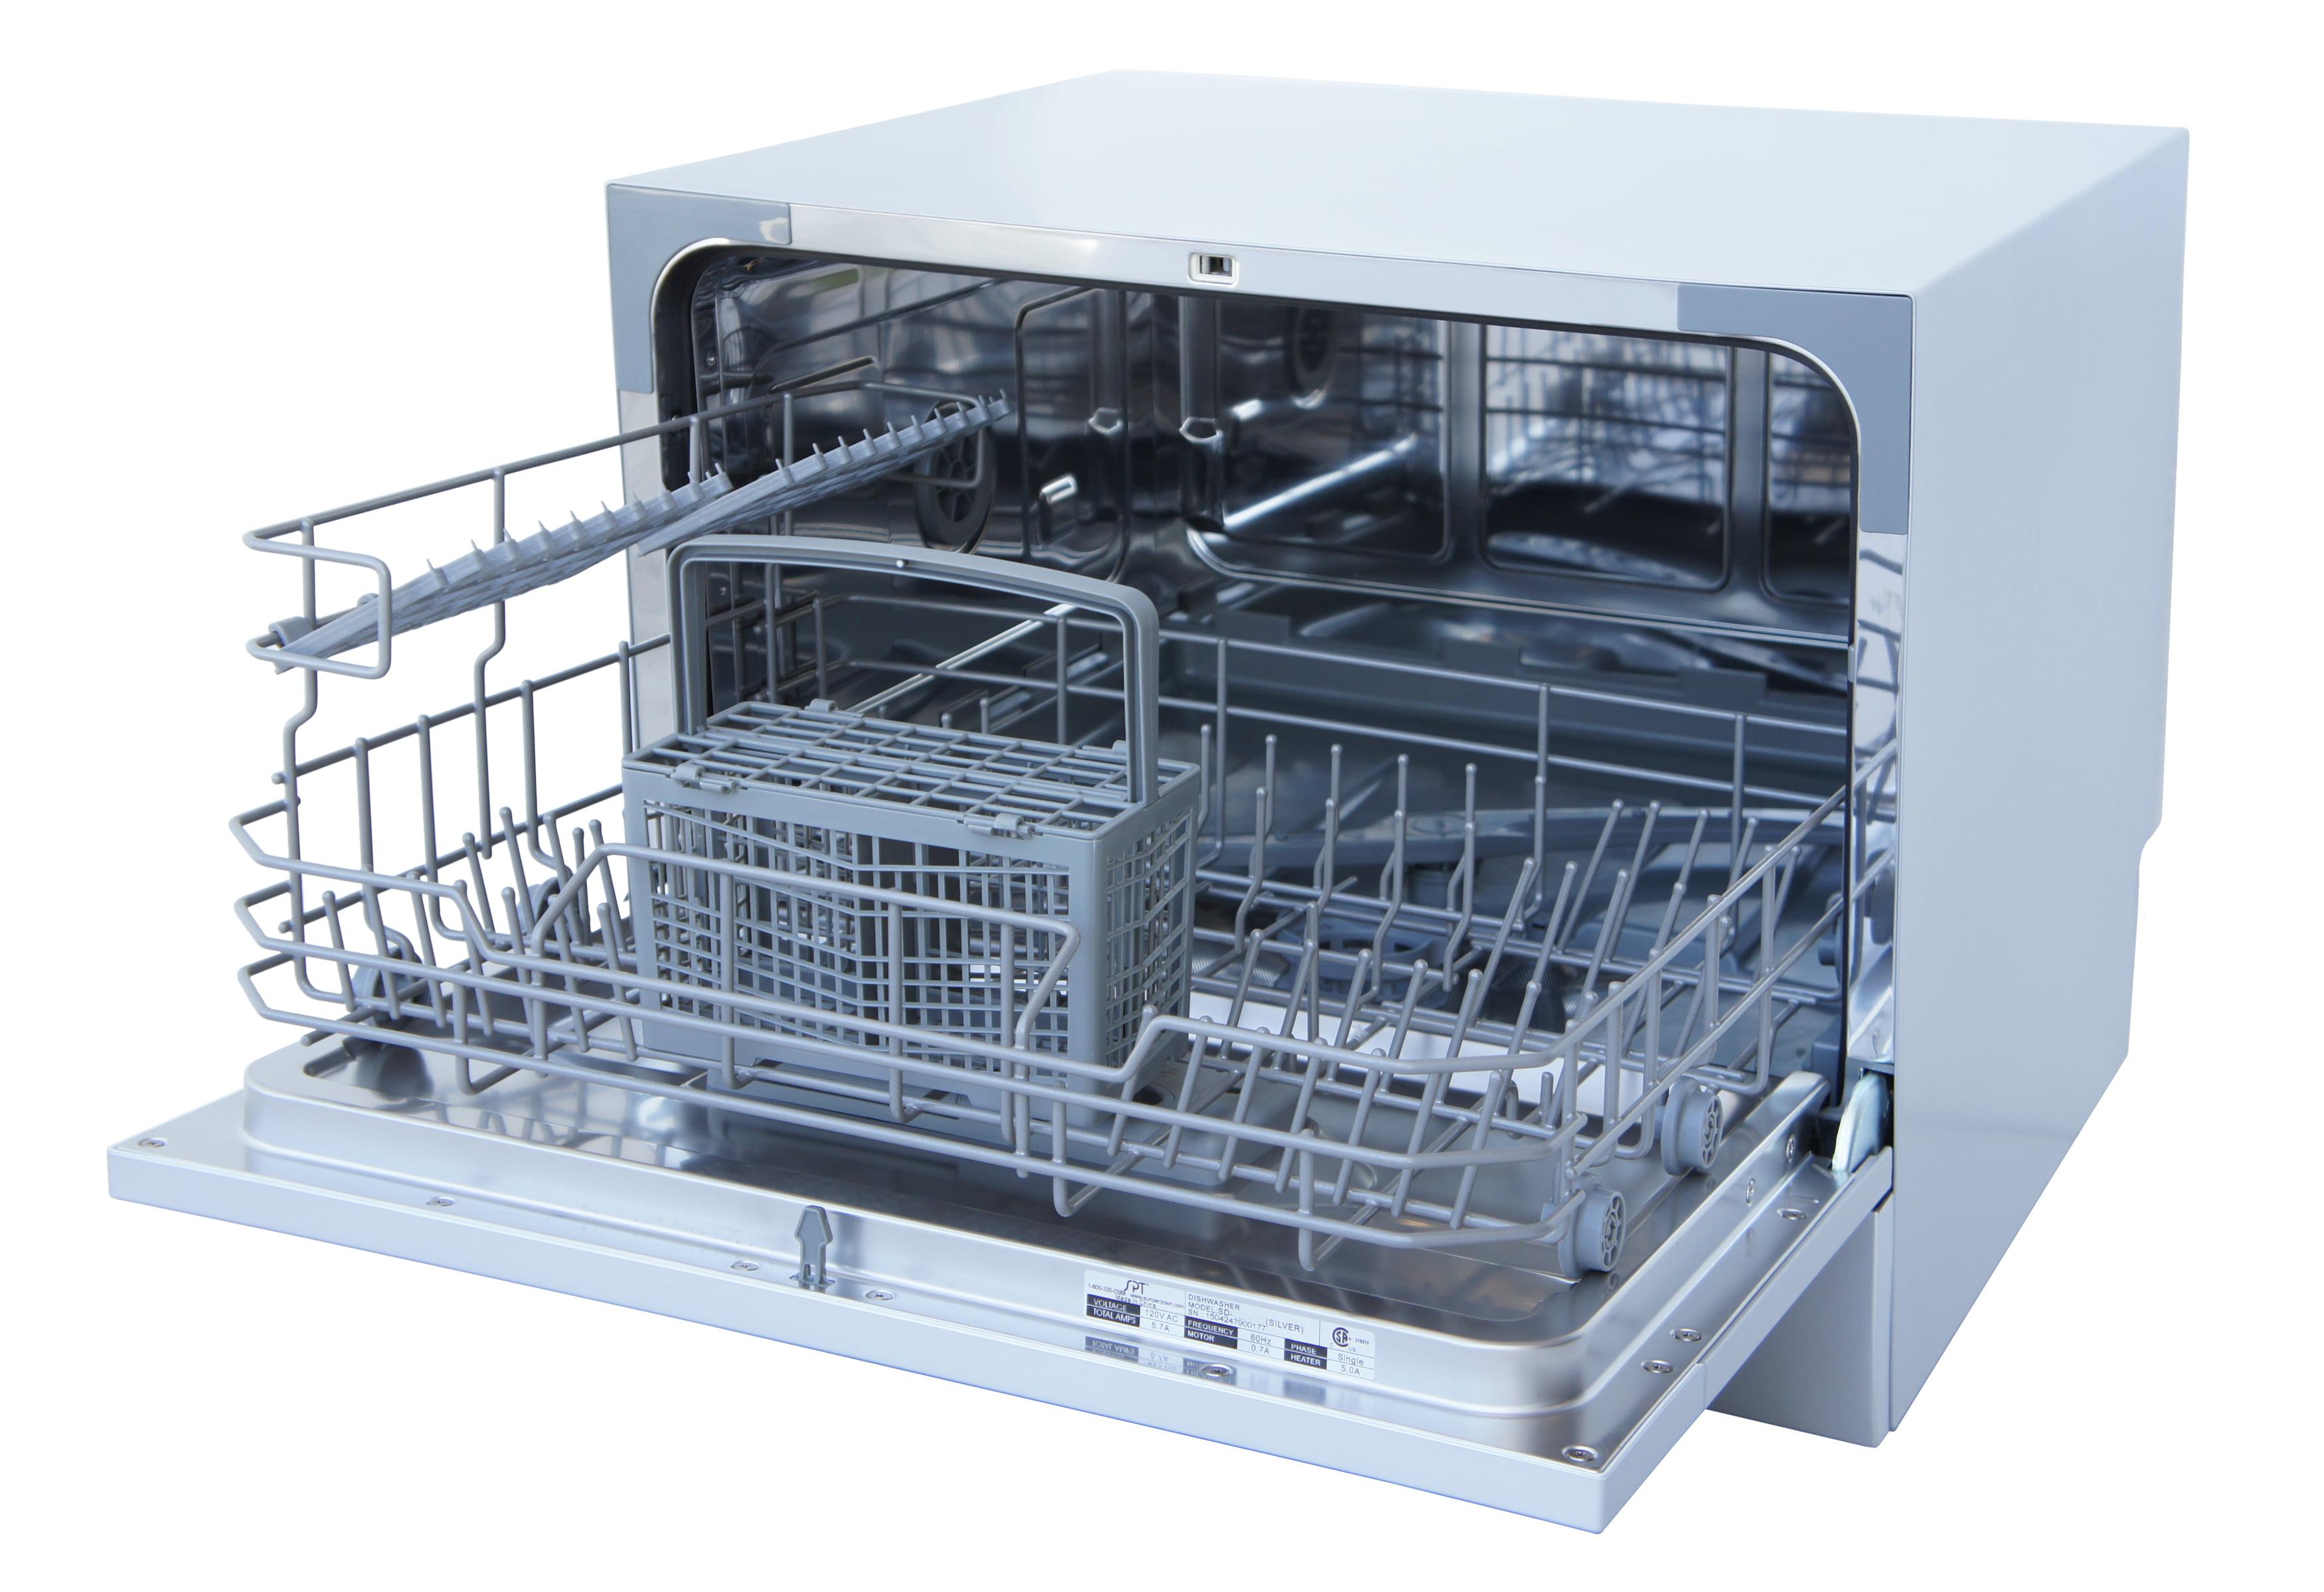 sunpentown countertop dishwasher 2210 series white walmart com rh walmart com